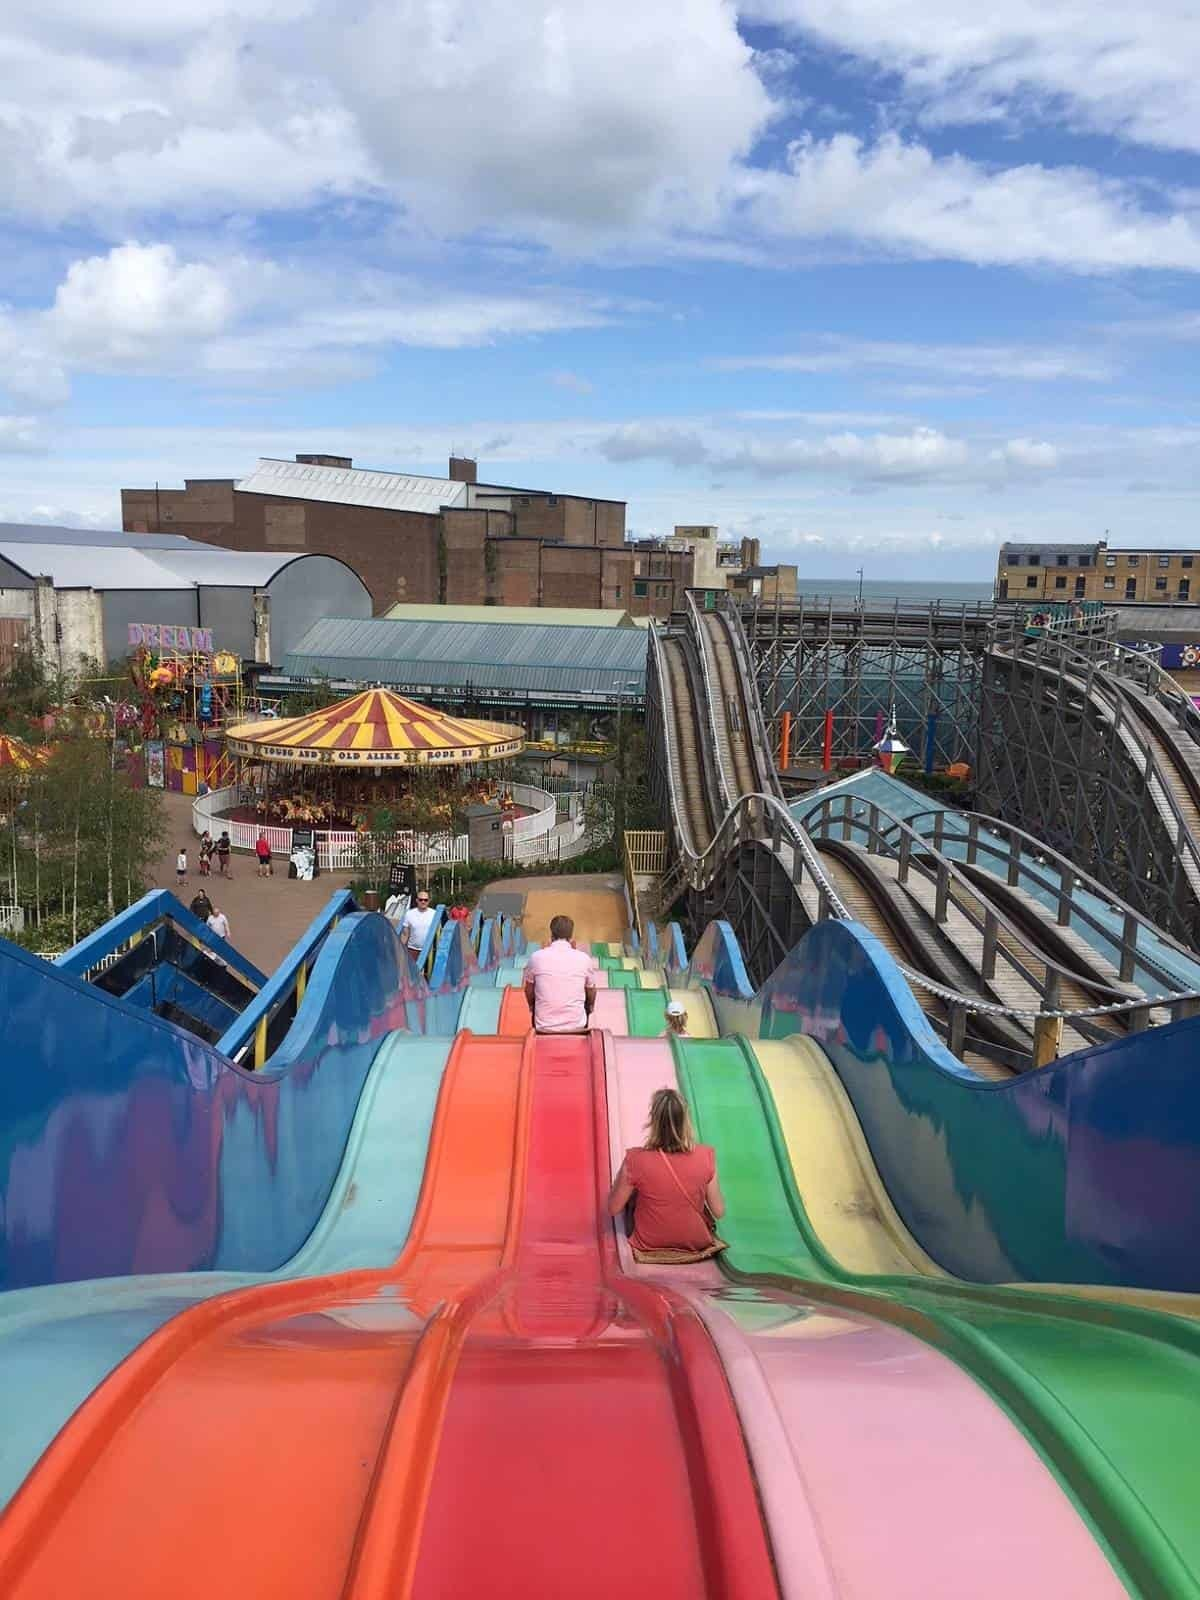 Born Slippy ride at Dreamland Margate